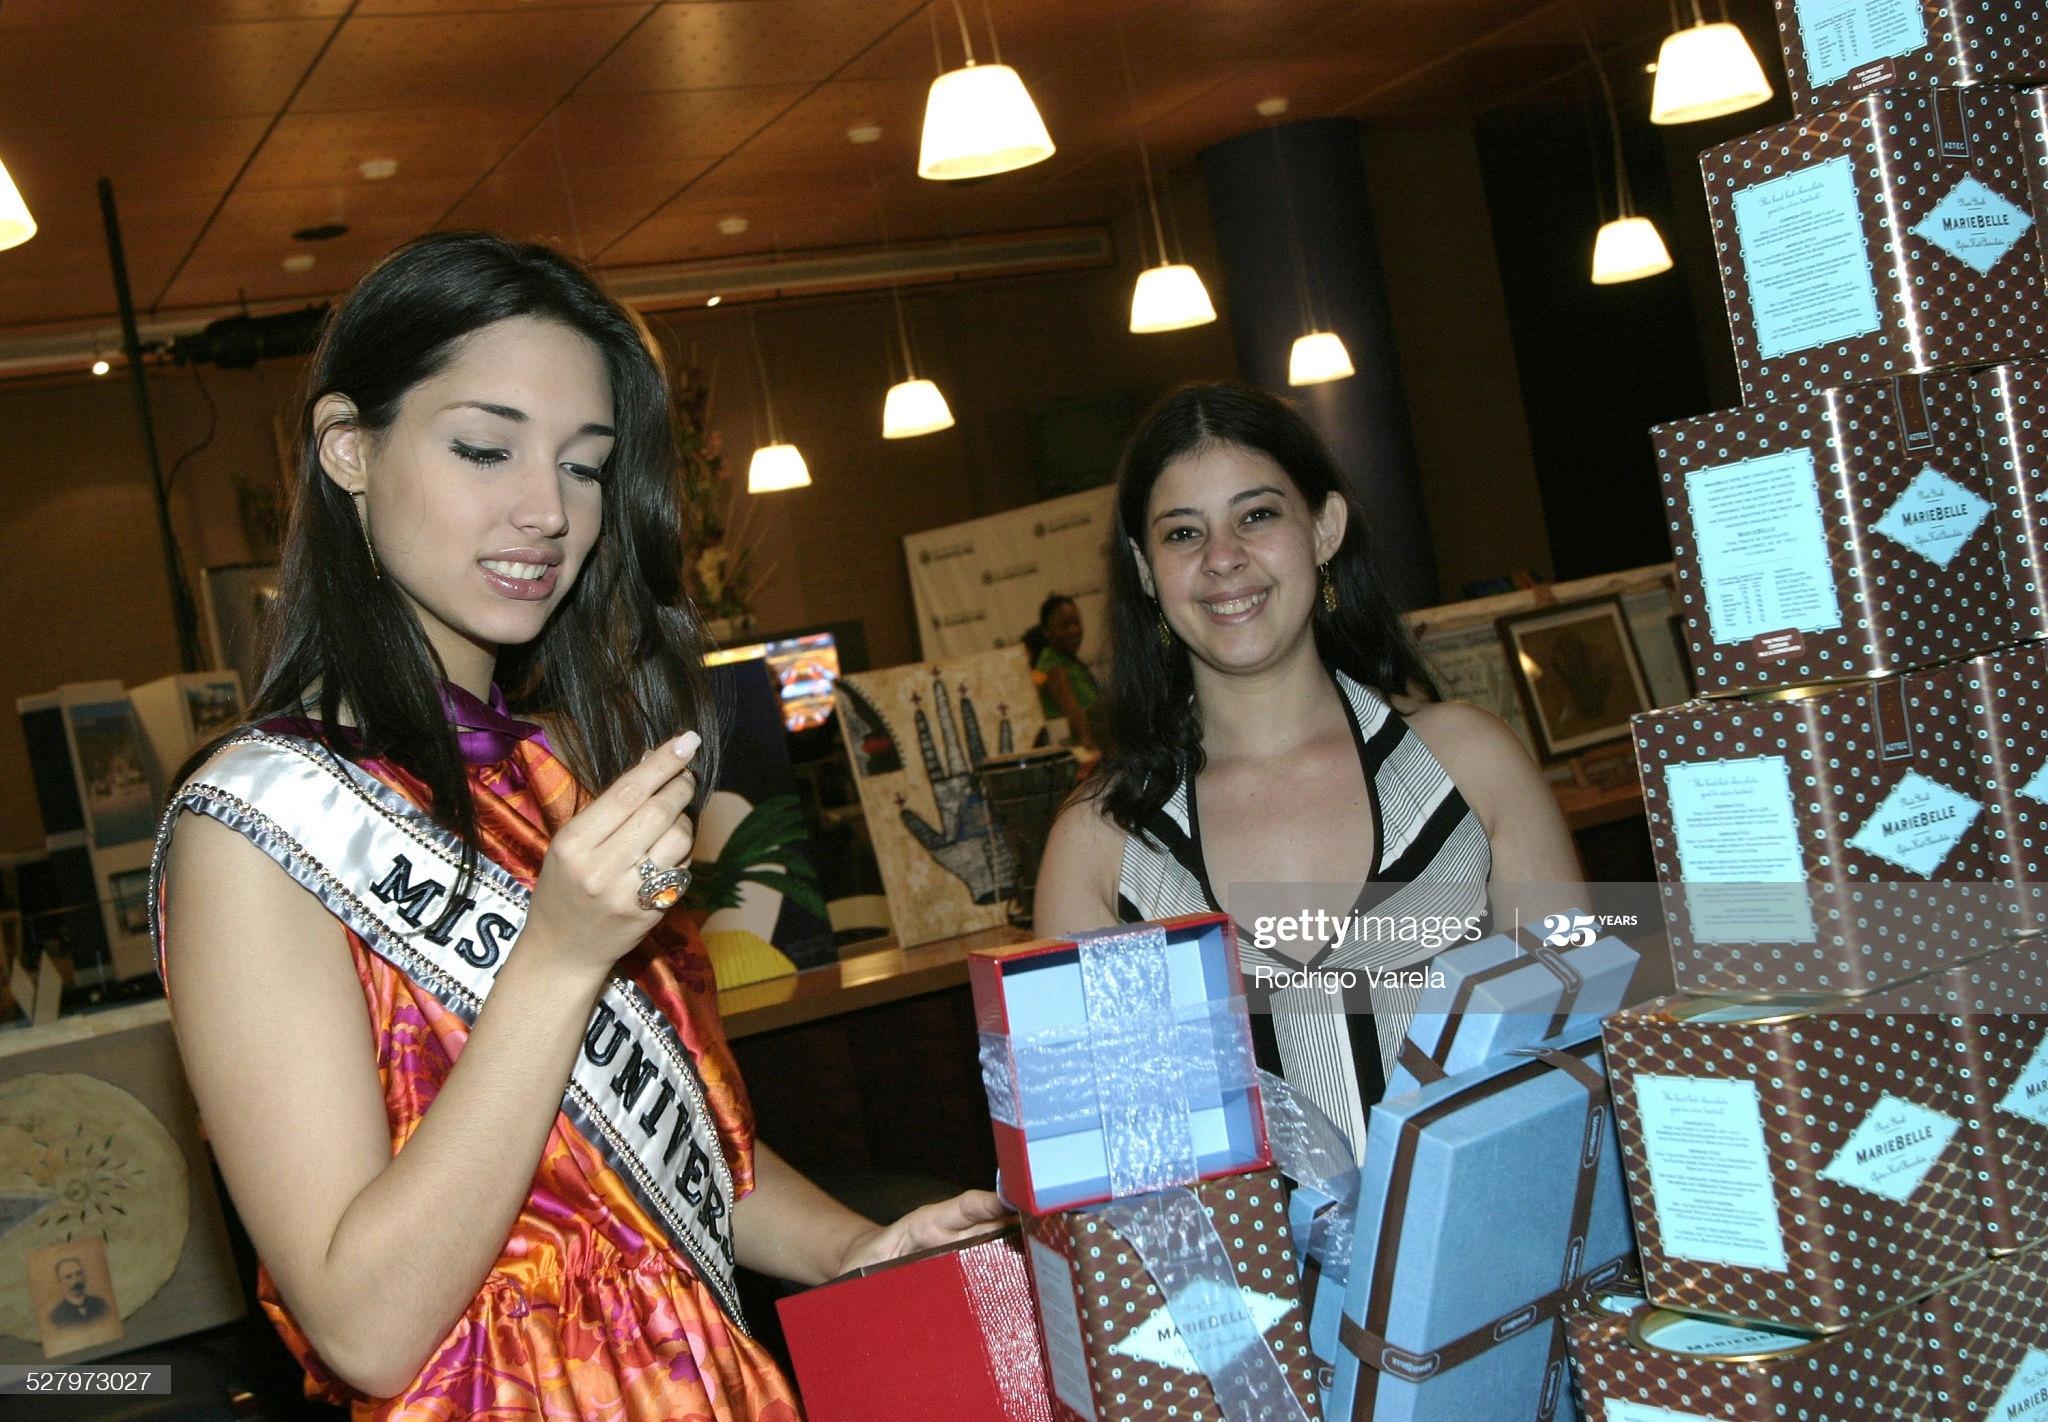 ════ ∘◦❁◦∘ ════ Amelia Vega, Miss Universe 2003. ════ ∘◦❁◦∘ ════ - Página 12 Miss-u50